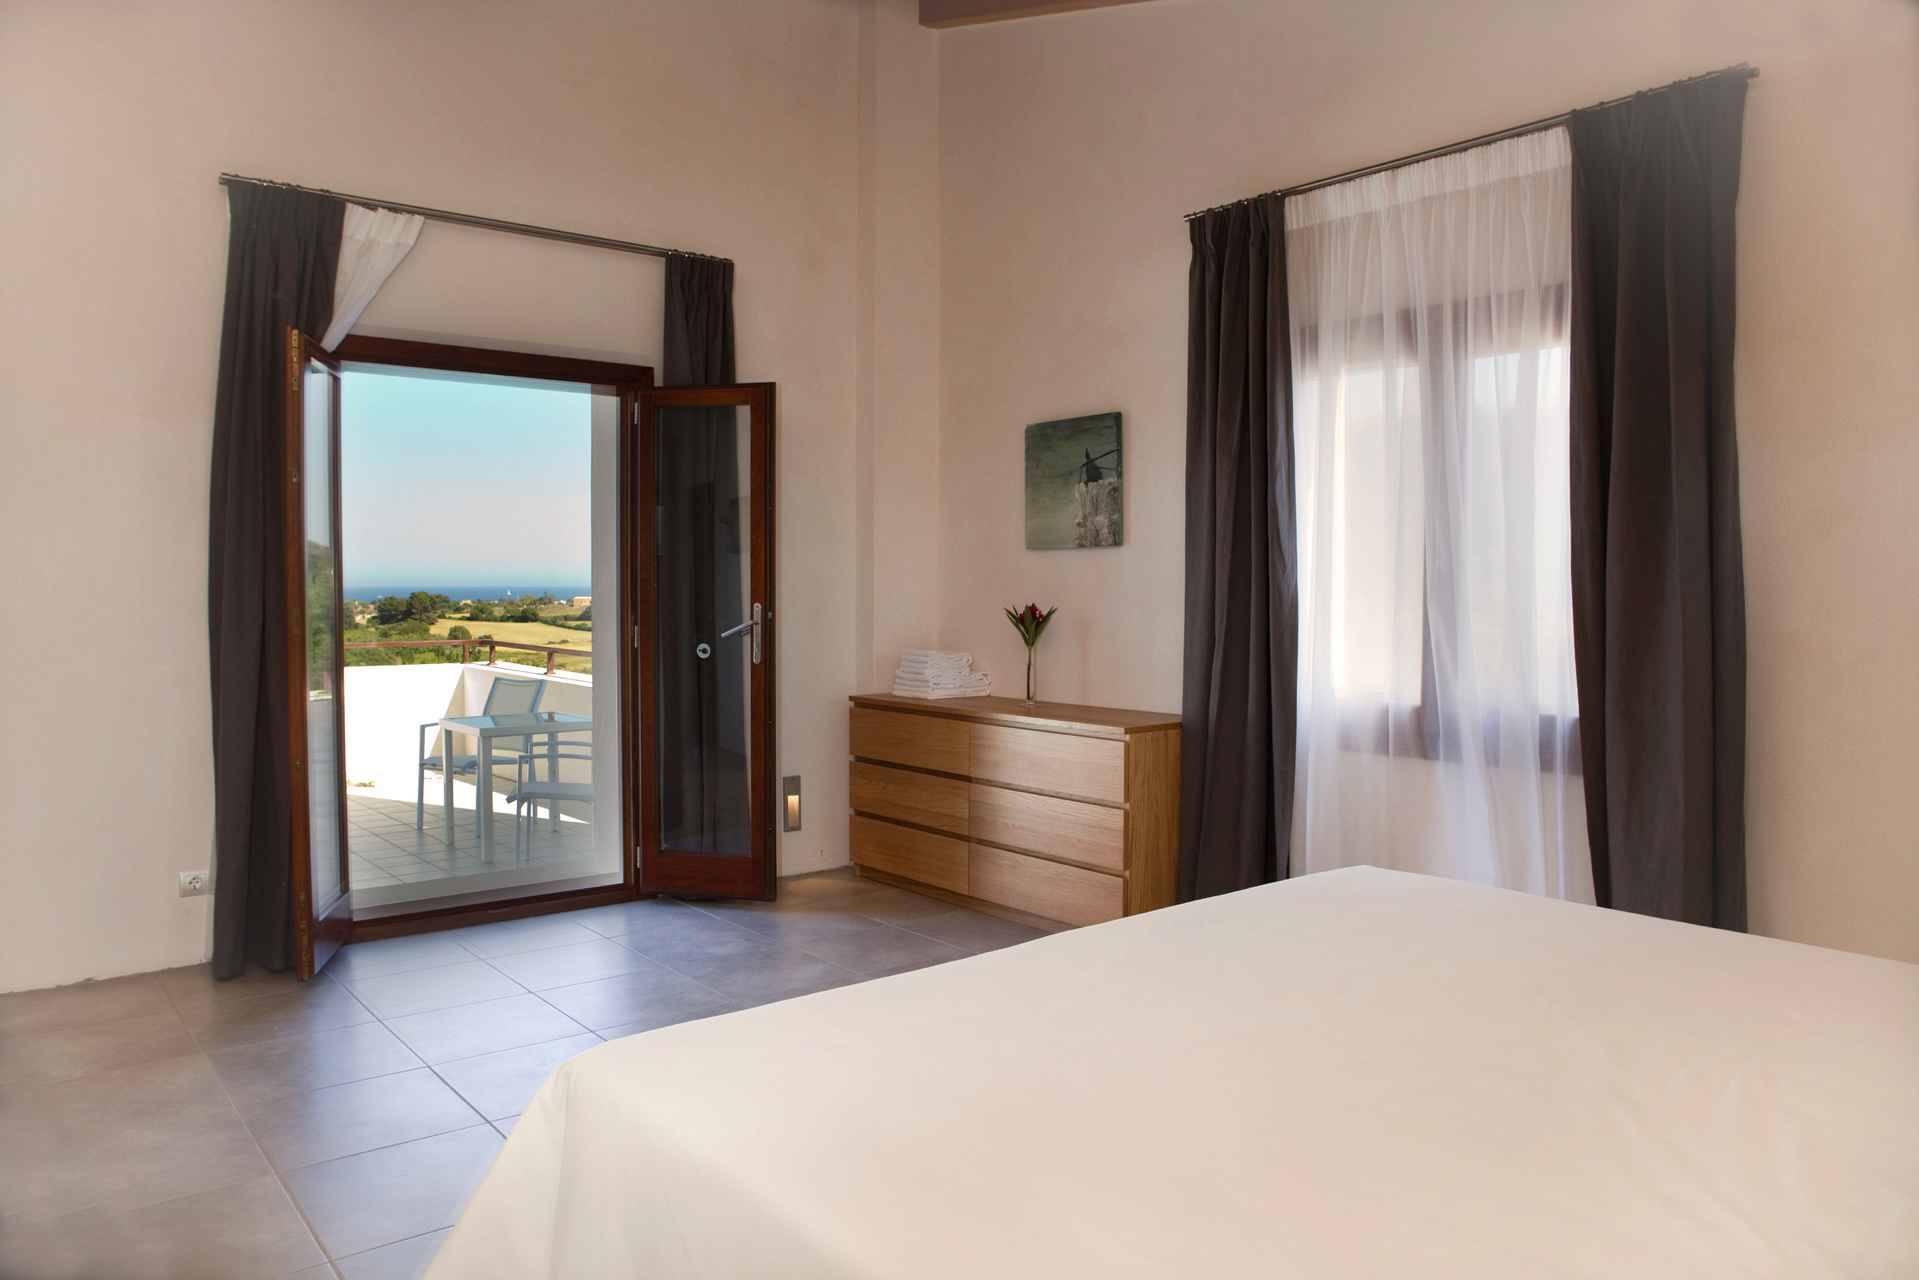 01-28 Luxus Finca Mallorca Nordosten Bild 40